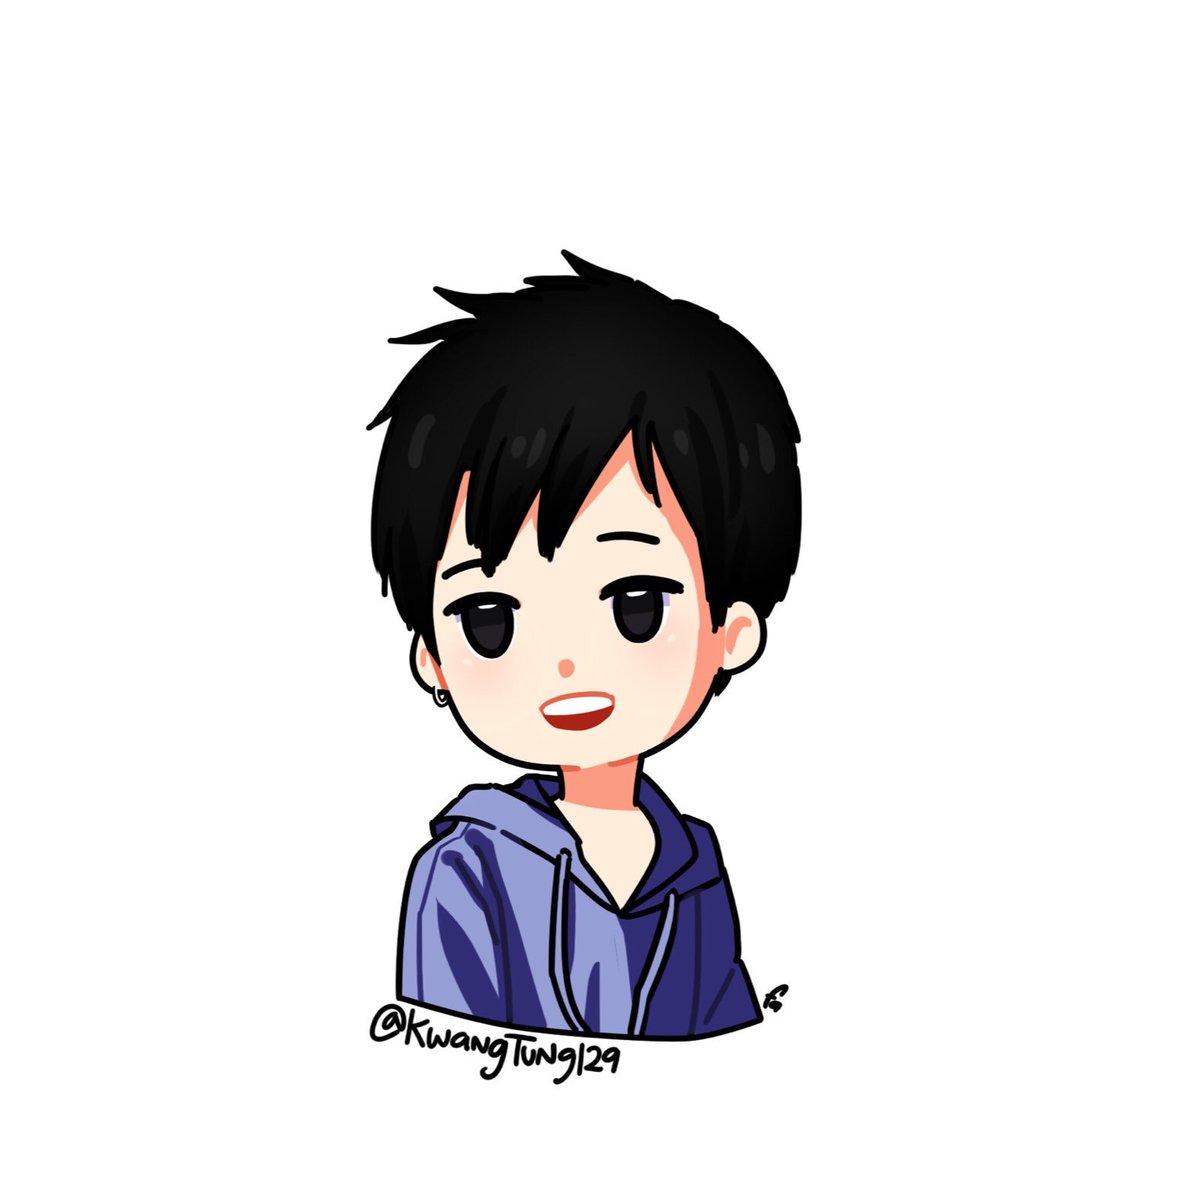 Have a nice day  pict© @HAN___BURGER  #비아이 #한빈 #kimhanbin #hanbin #BI #iKON #withikonic #fanartikon #ikonfanart<br>http://pic.twitter.com/NTVEaRldTa